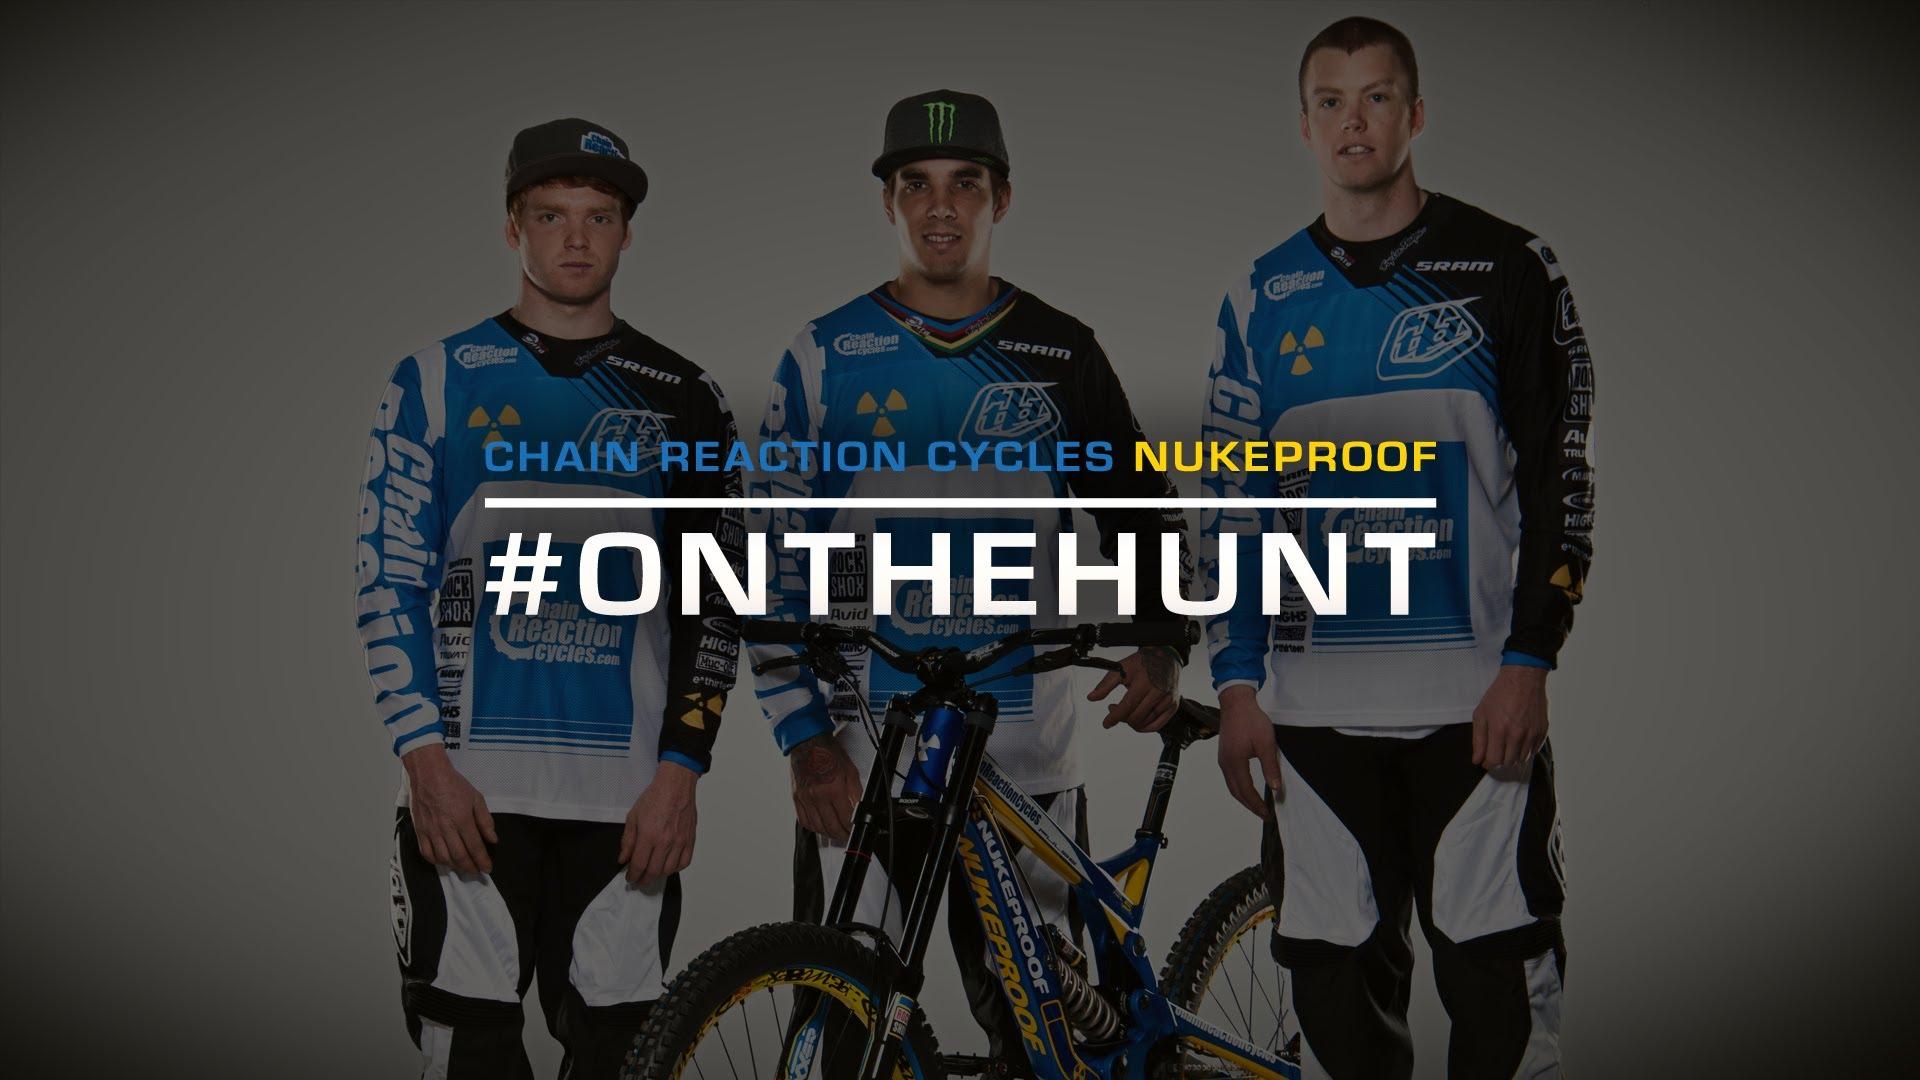 CRC/Nukeproof – On the hunt – епизод 1